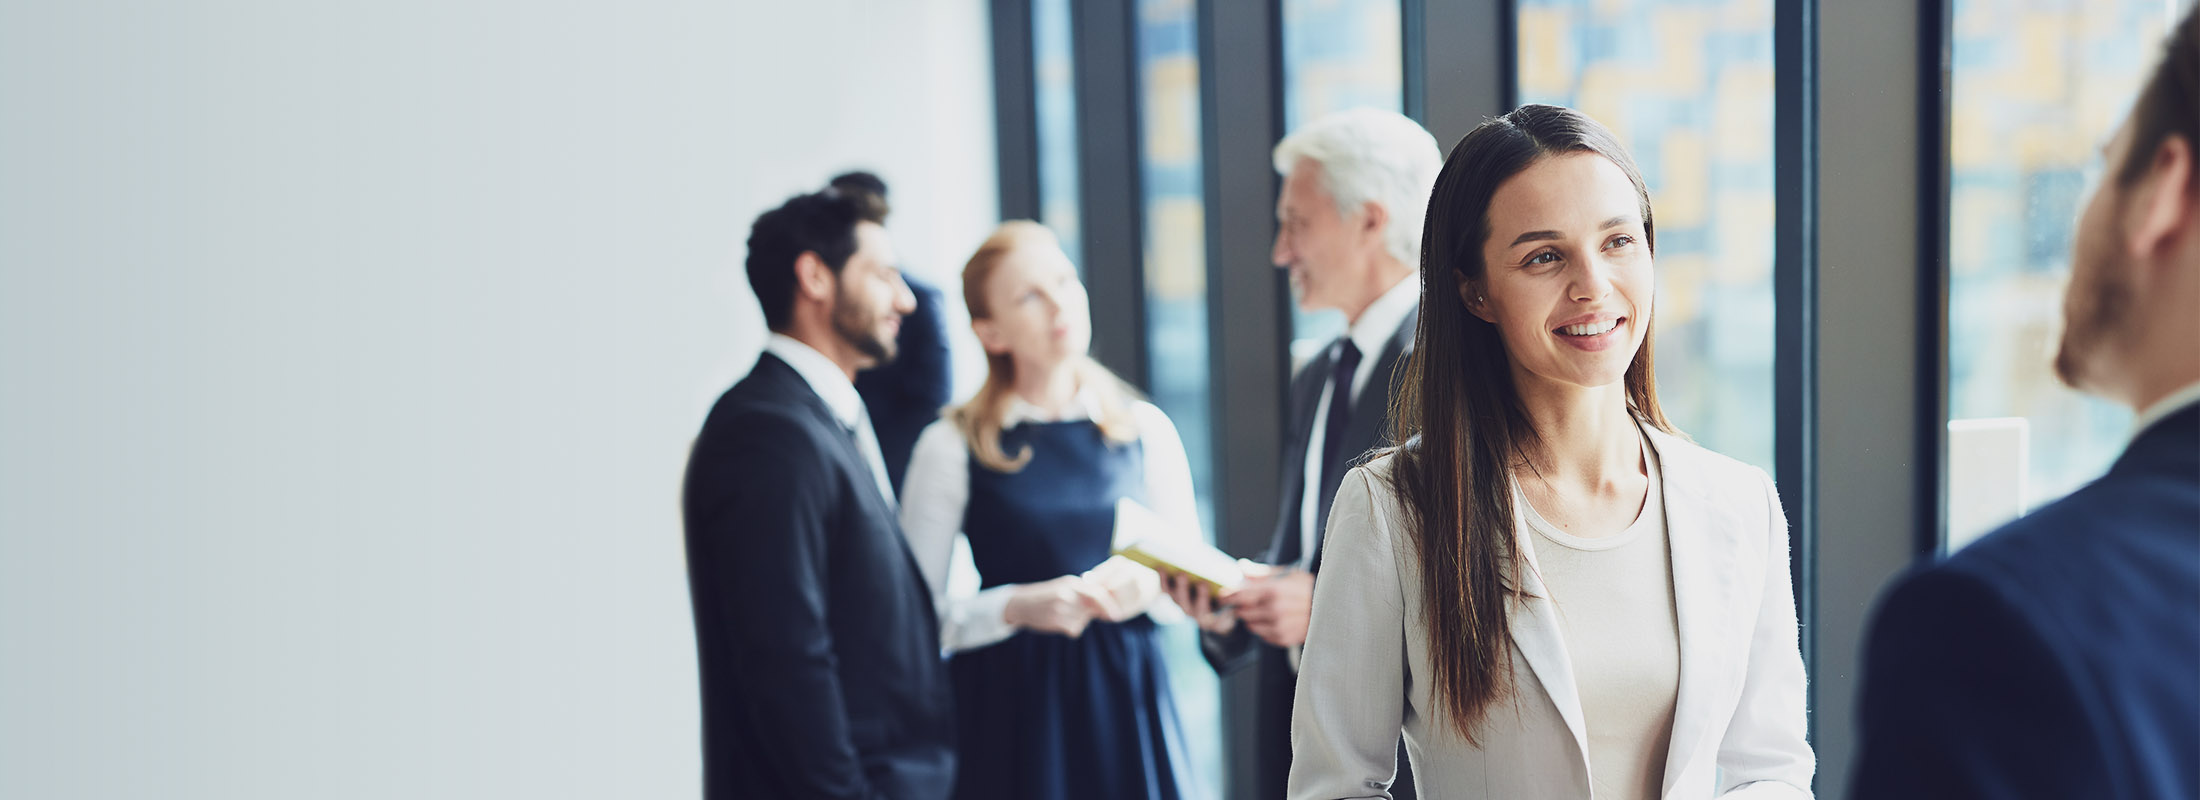 CPRO INDUSTRY Unternehmen SAP-Beratung